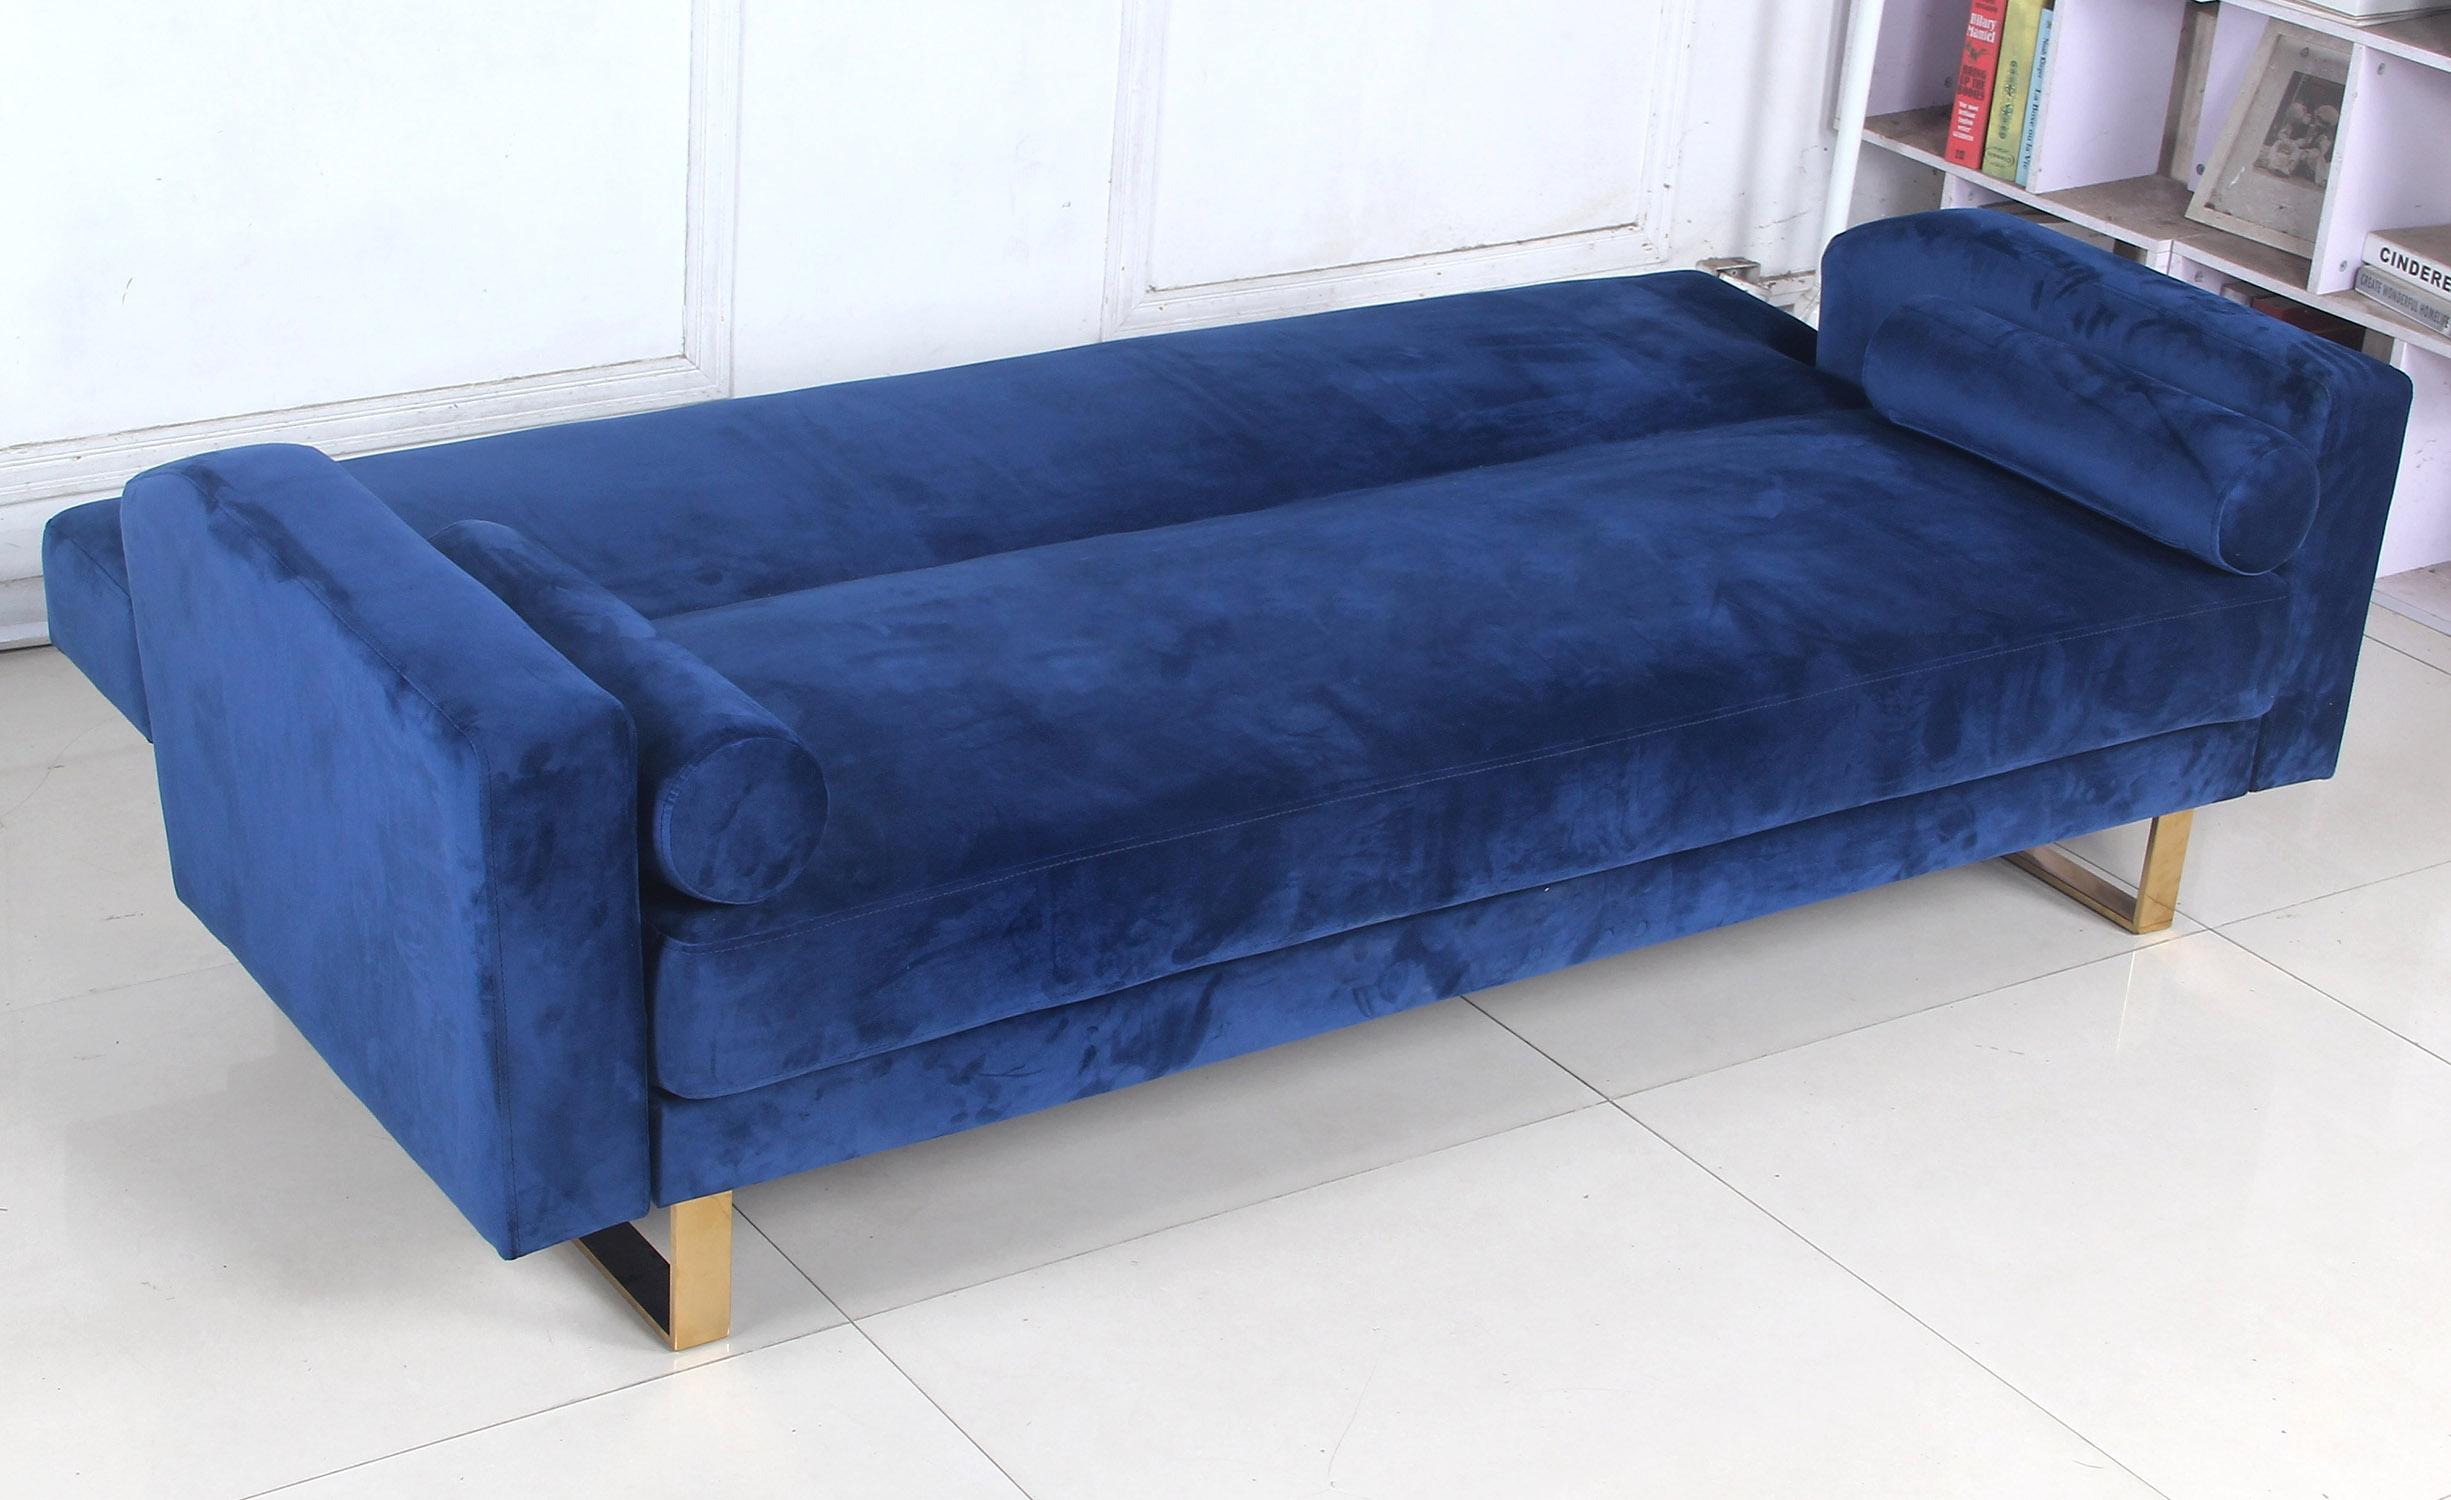 Canapé convertible clic-clac Djobi Velours Bleu Pied Or